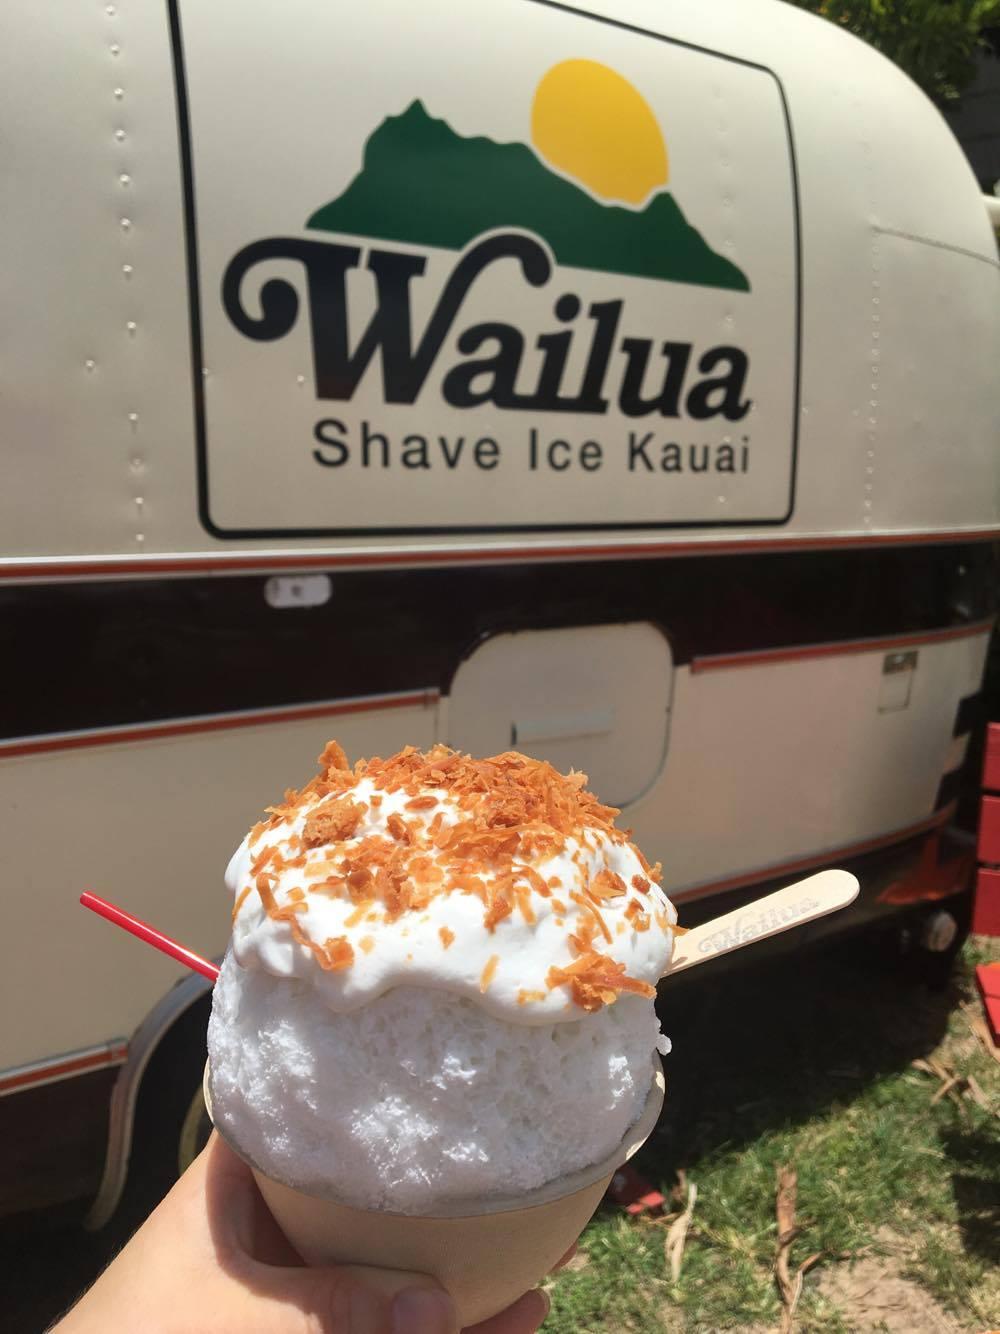 #1 Wailua Shave Ice -           Personal Favorite:     Coconut x Coconut x Coconut:Coconut Milk, Haupia Foam &Roasted    Coconut Flakes